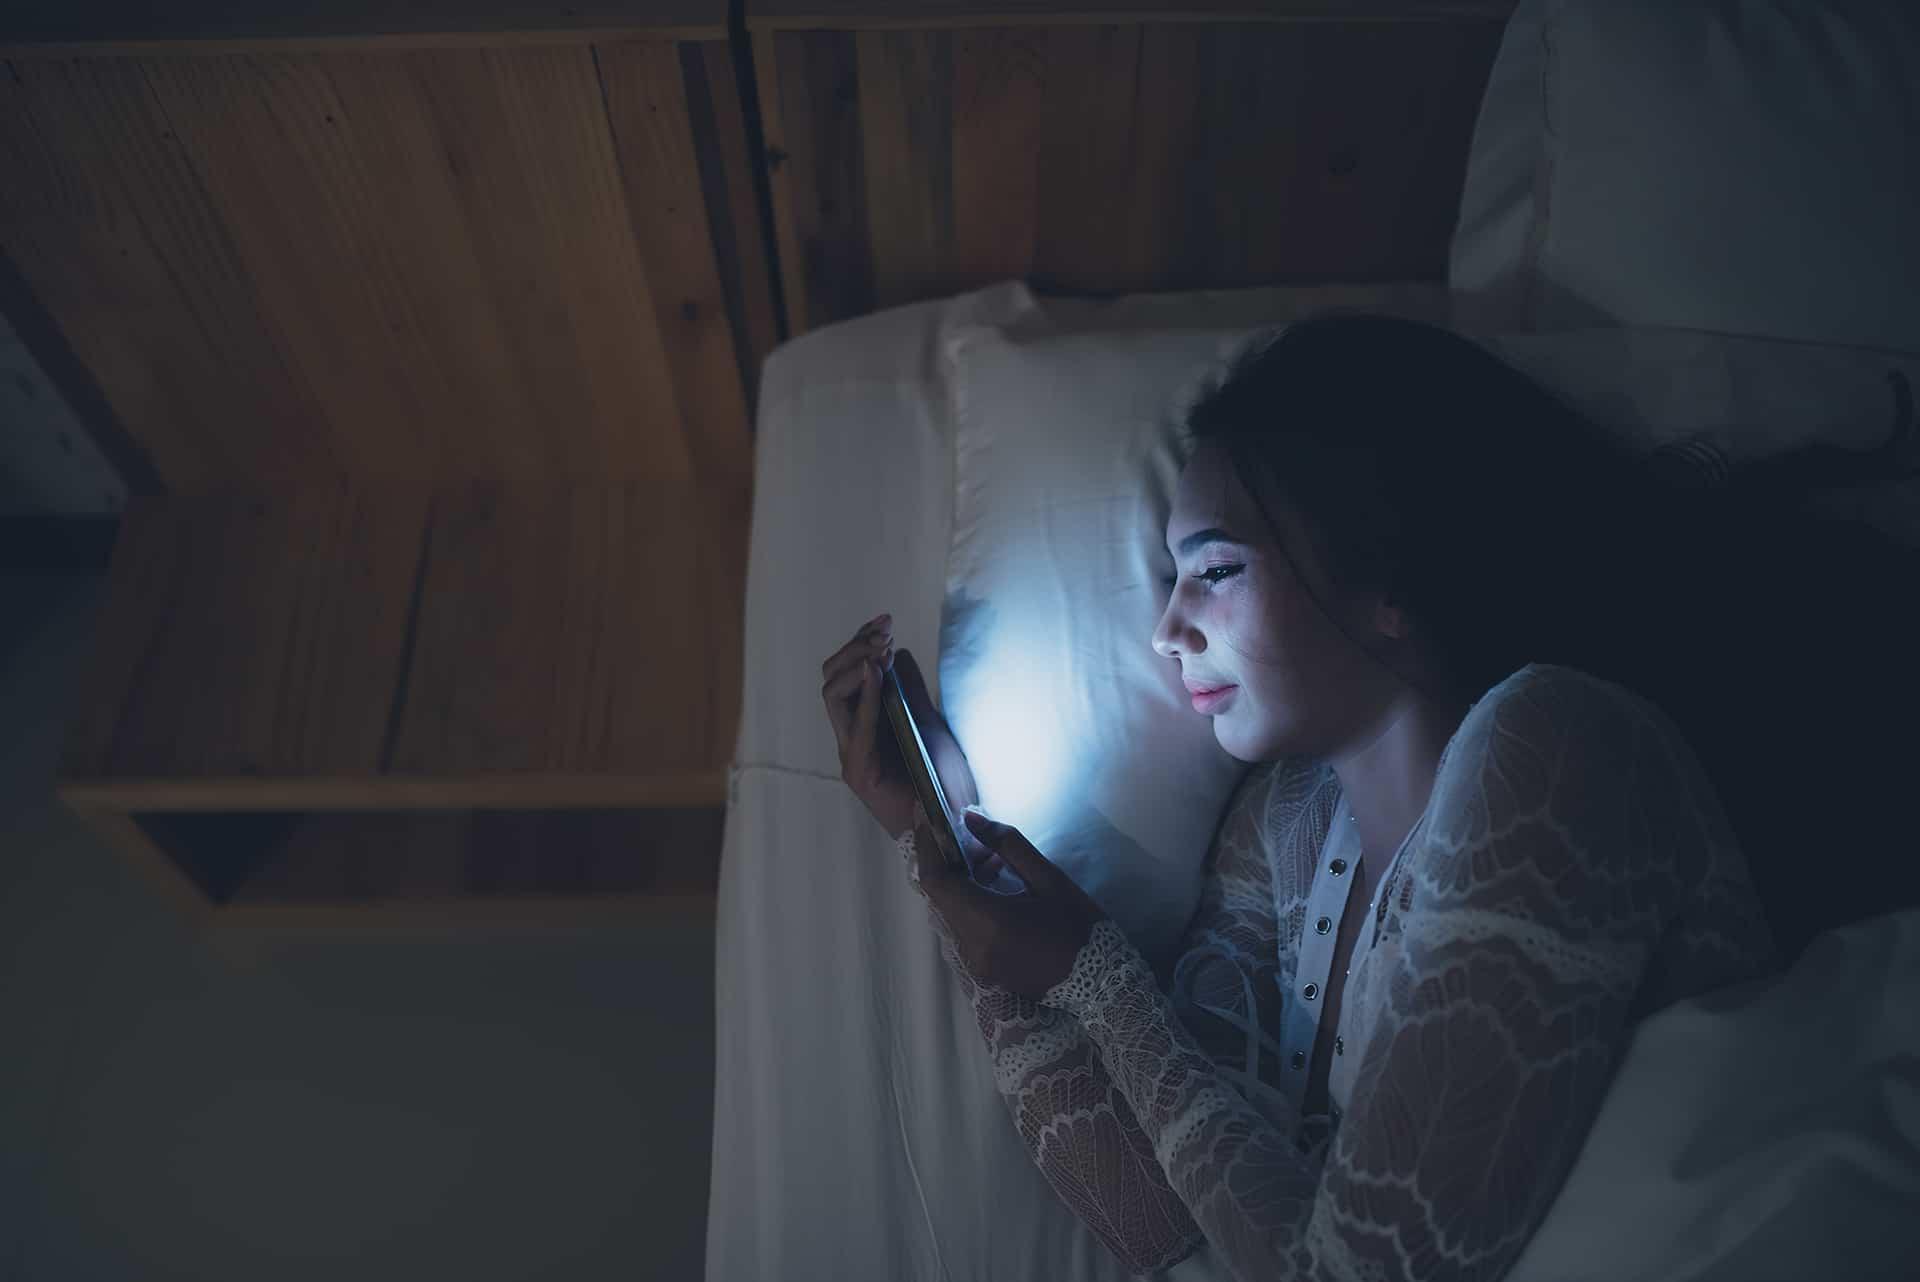 éviter écrans avant dormir